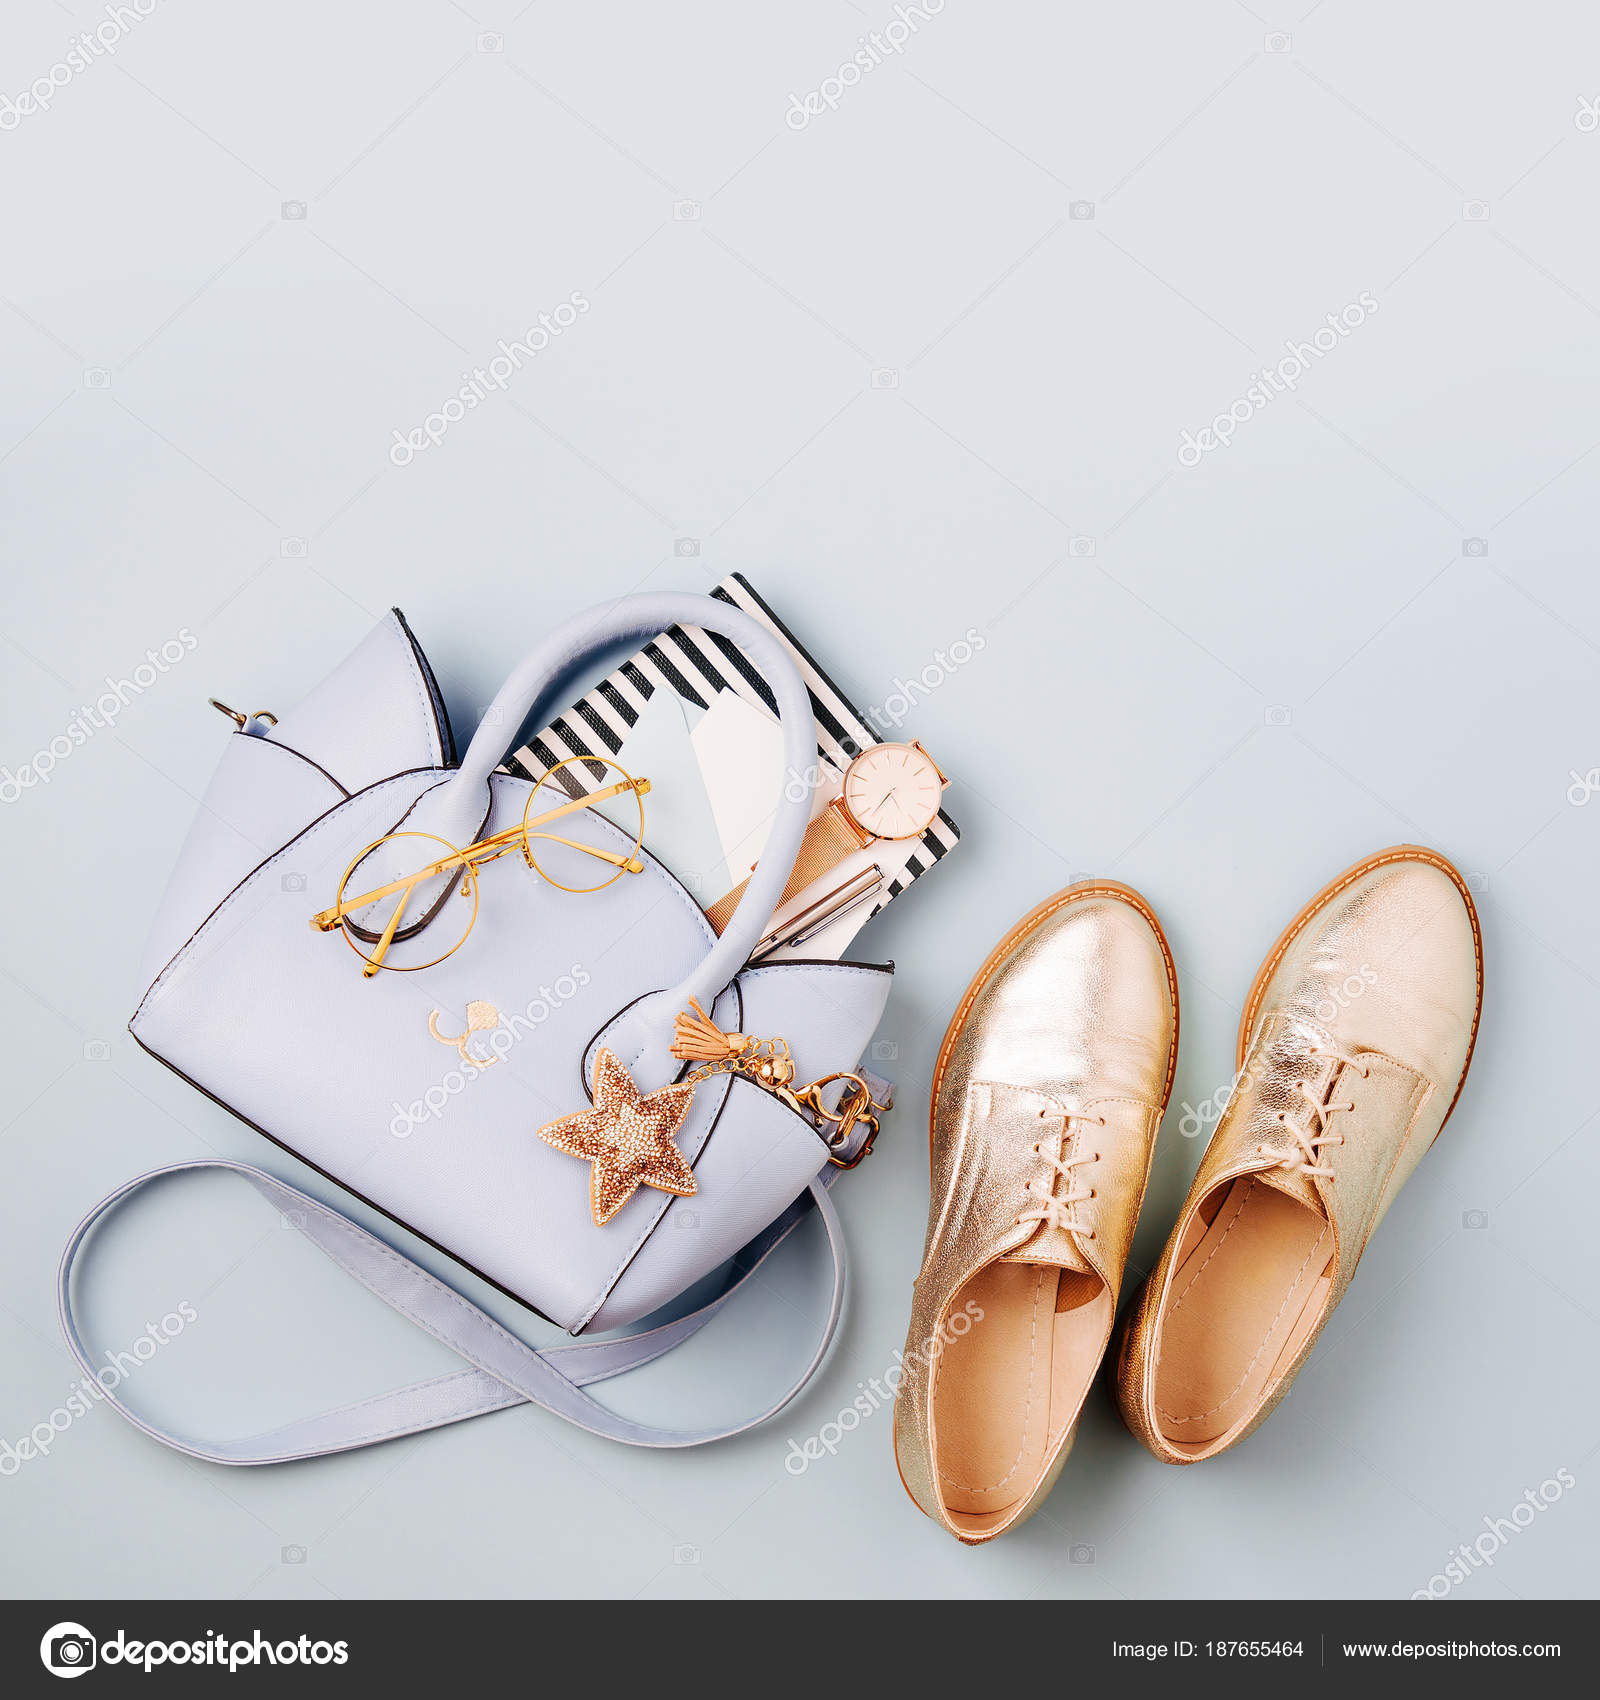 bbde7cdaa7 Saco Senhoras Azul Bonito Elegantes Sapatos Dourados Acessórios Femininos  Vista — Fotografia de Stock